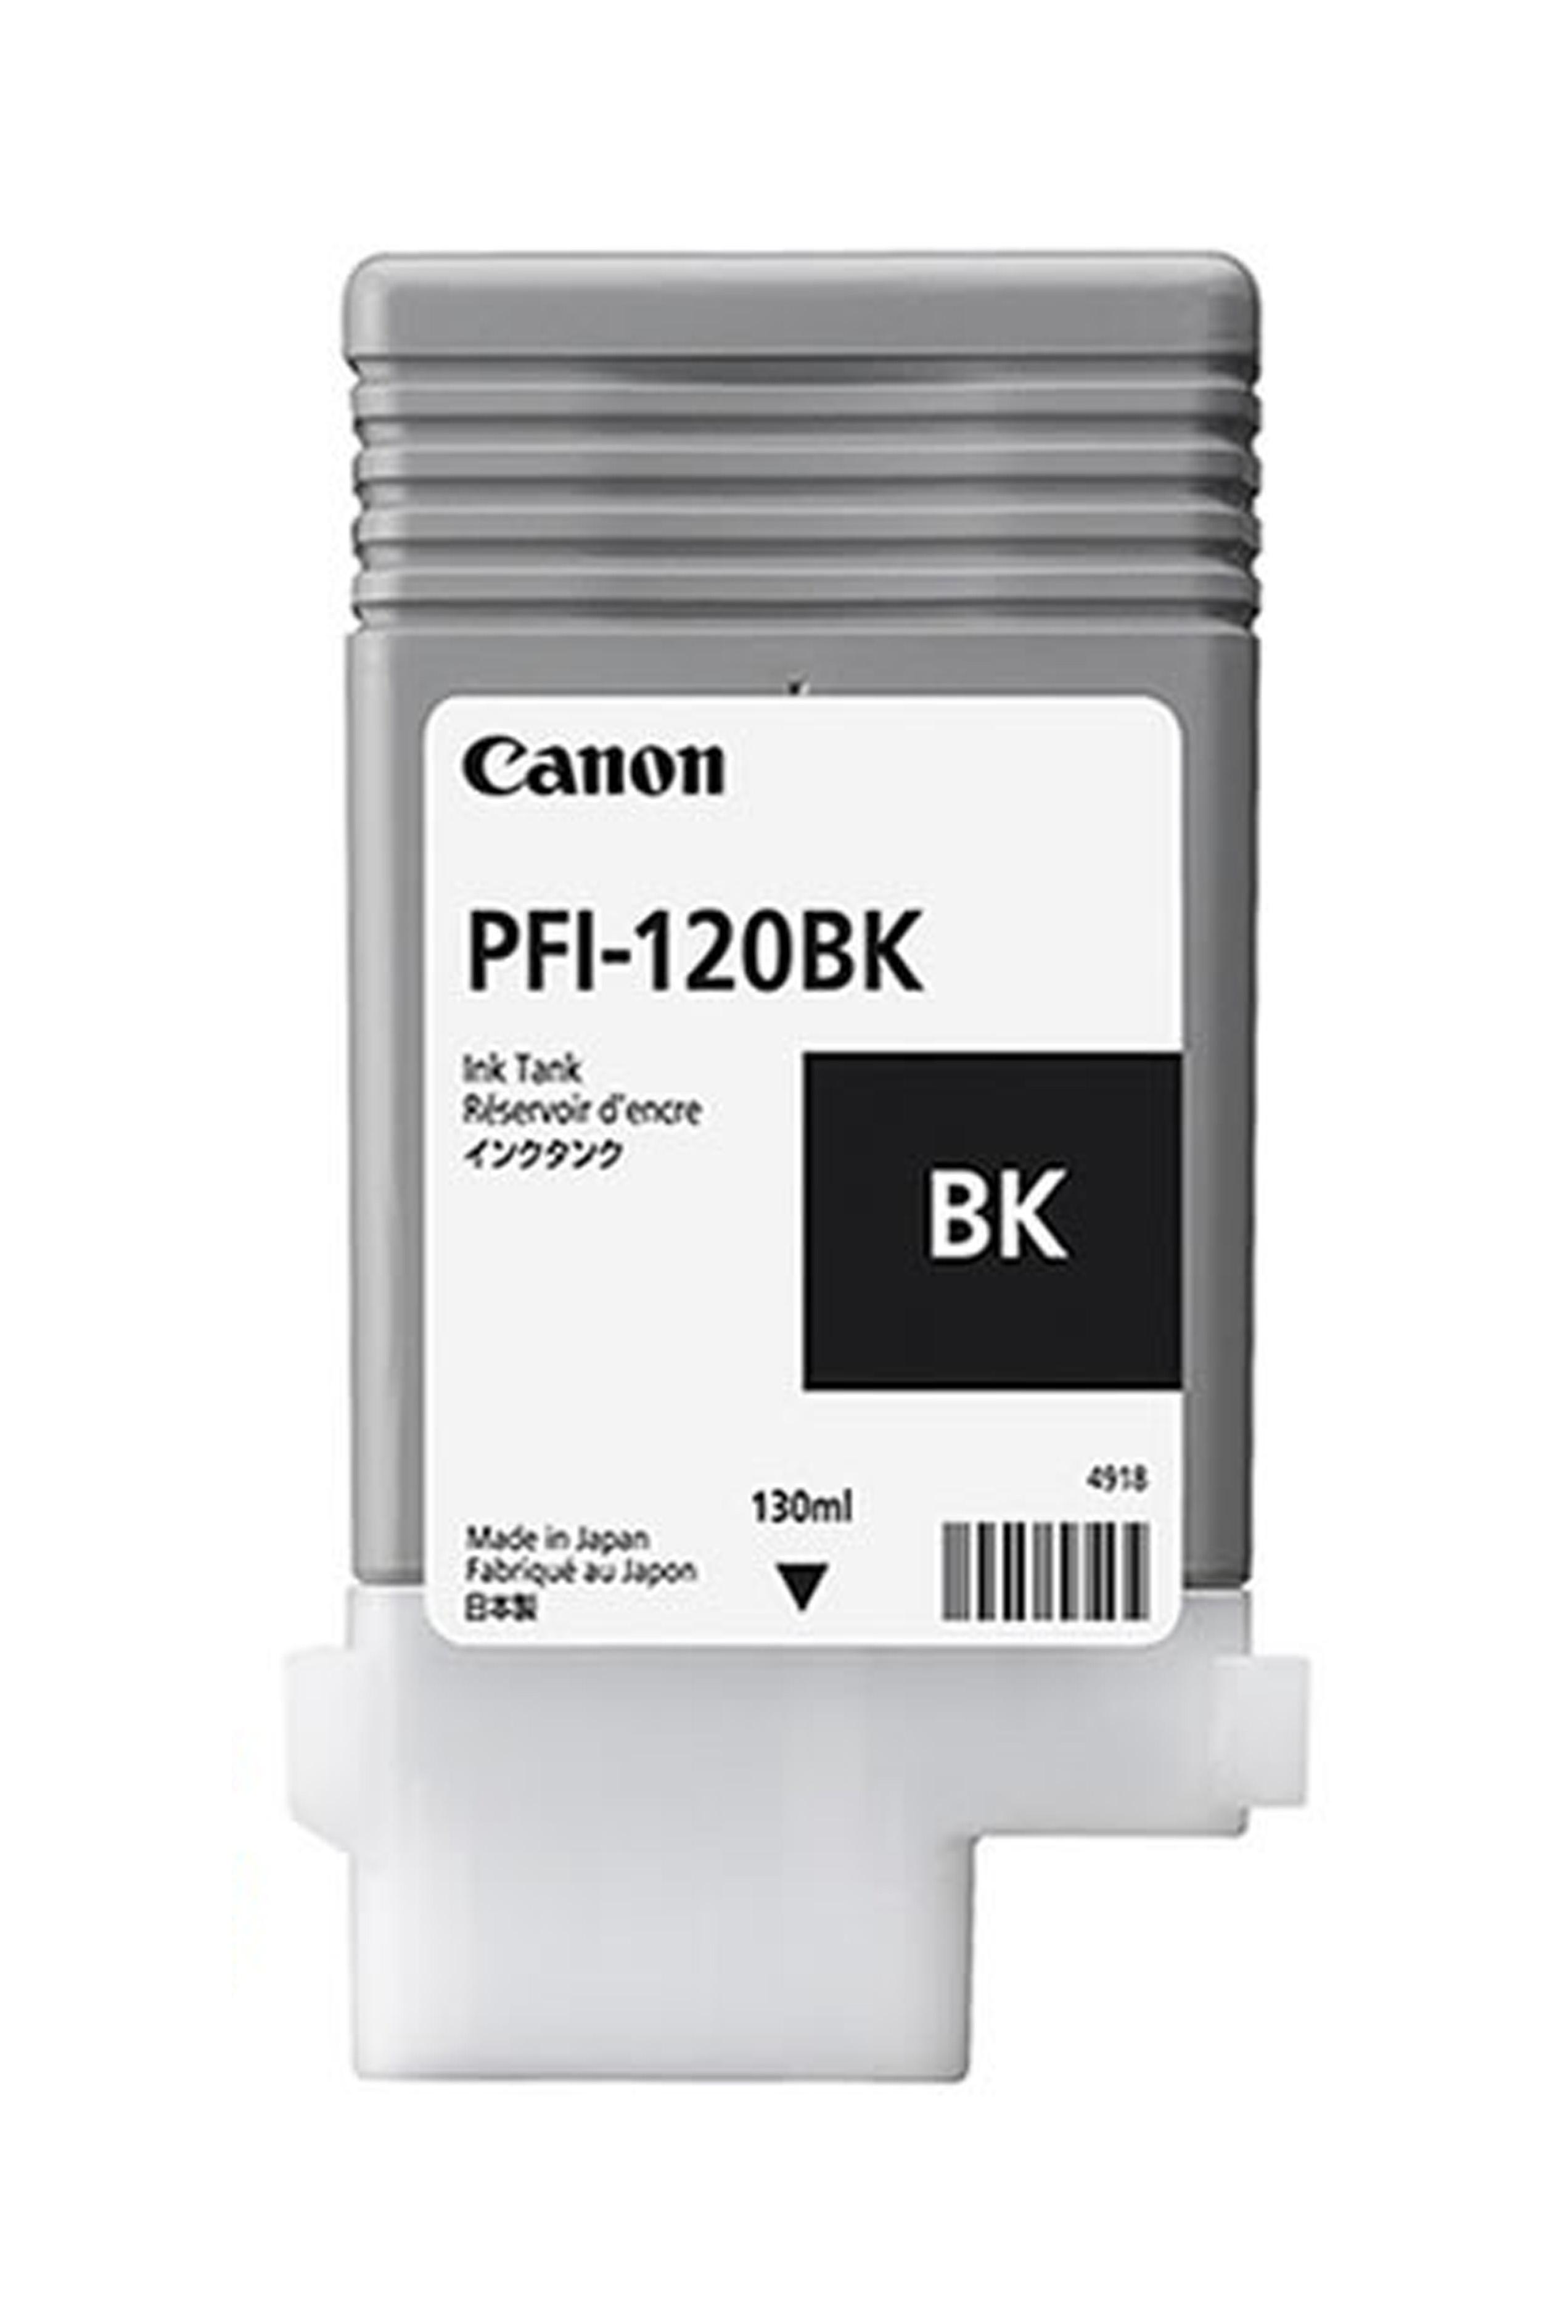 Canon Ink Tank PFI-120BK - Pigment Black Ink Tank 130 Ml...